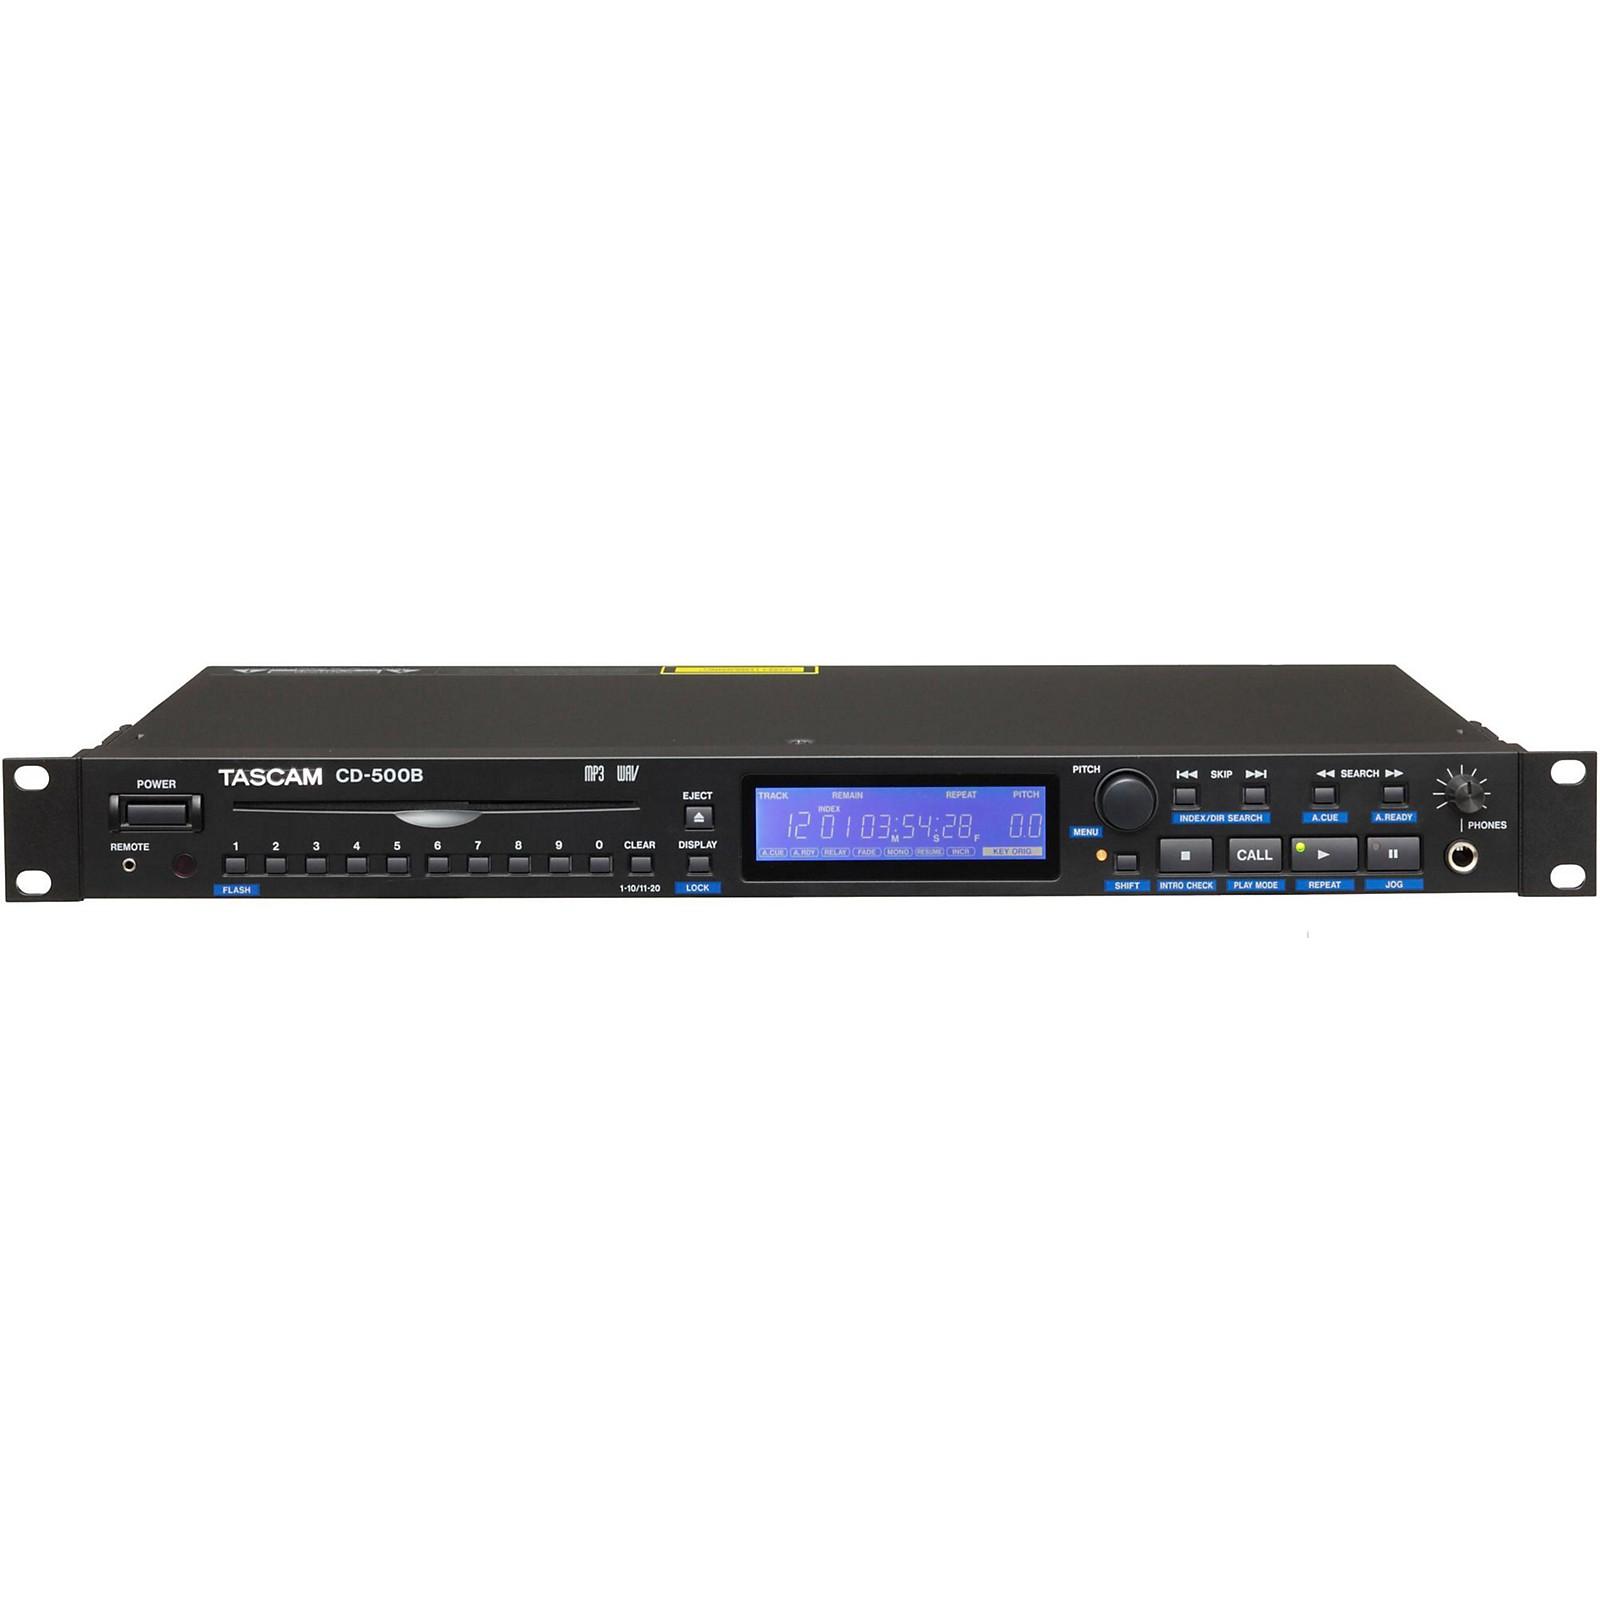 Tascam CD-500B Professional CD Player